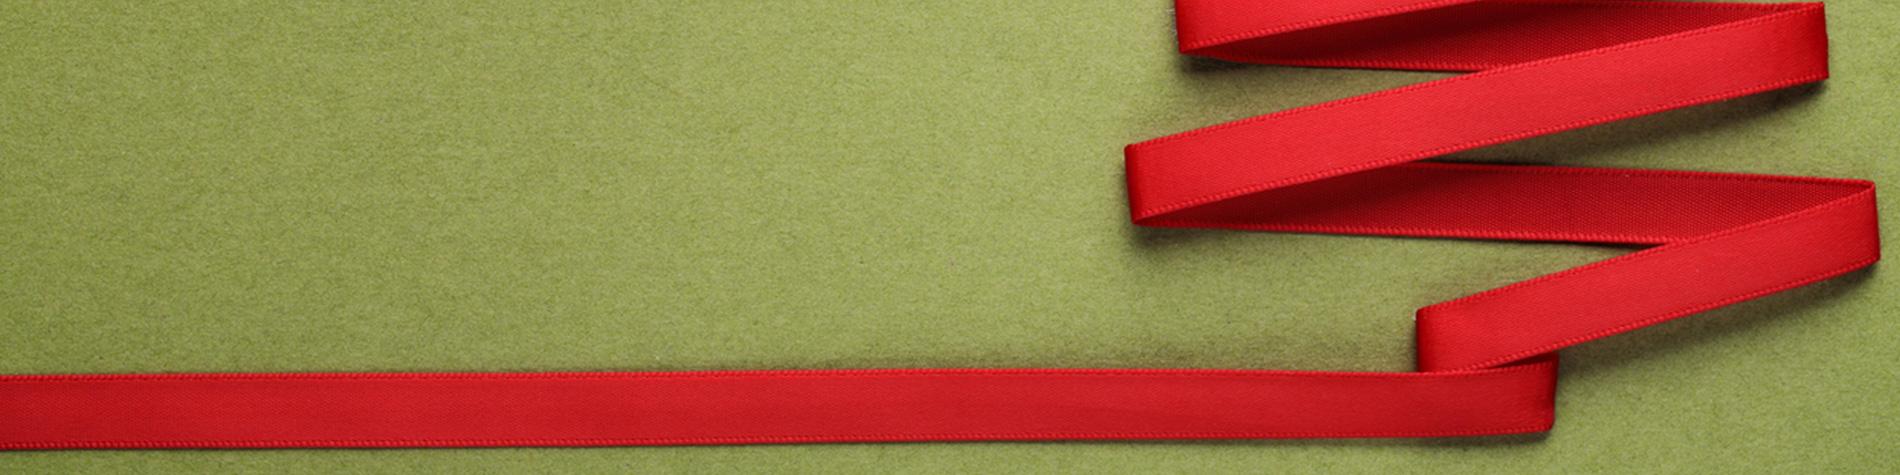 Wise Ways to Spend your Christmas Bonus - Wealth Advisors